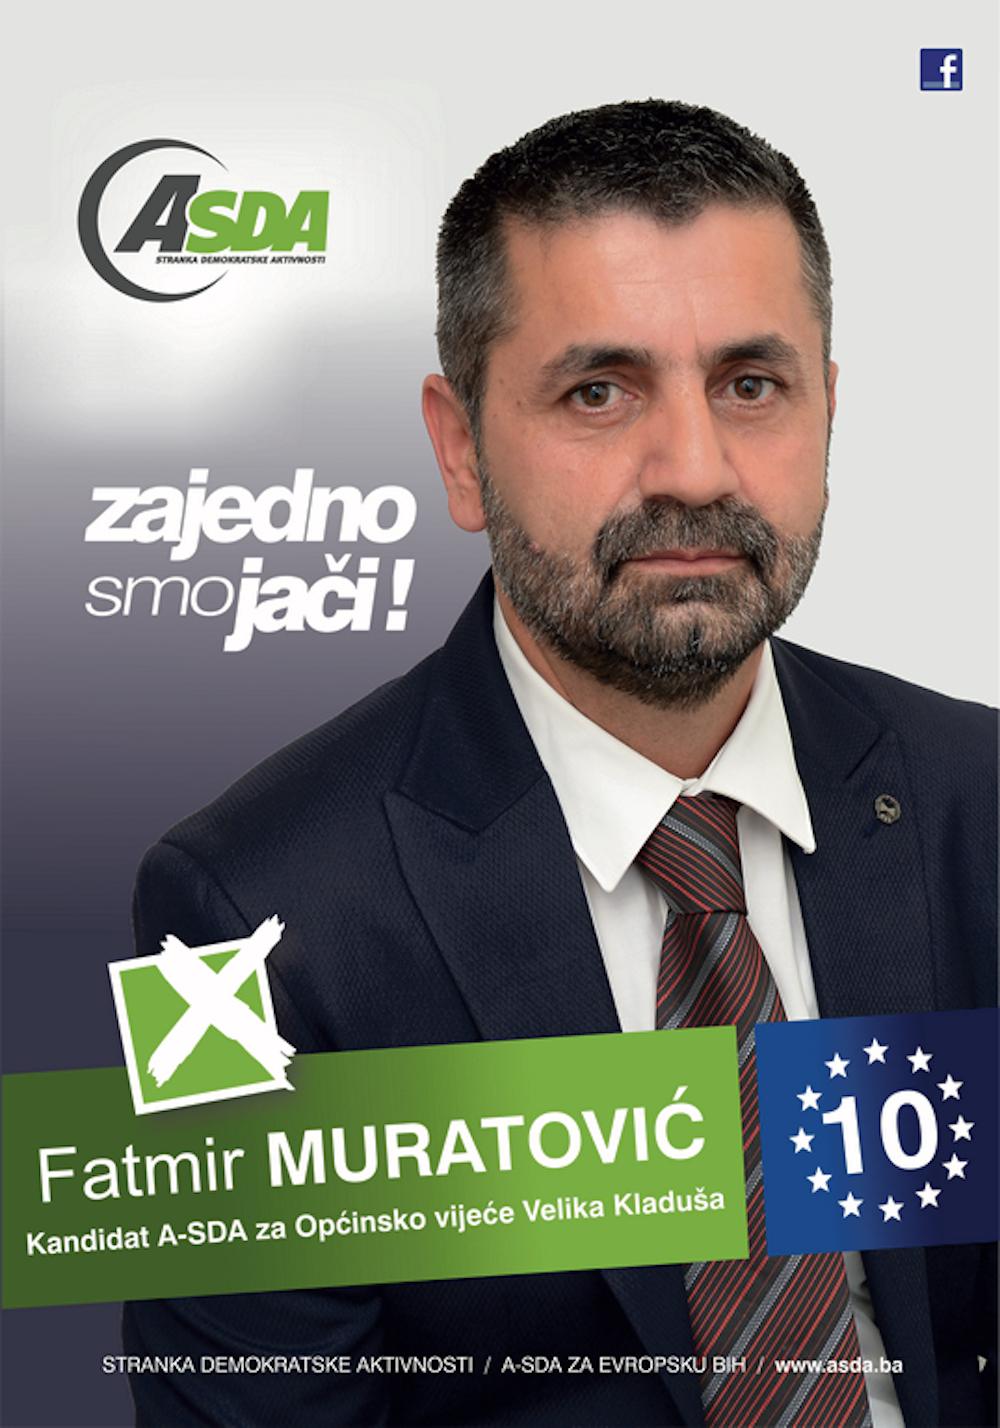 Fatmir Muratović